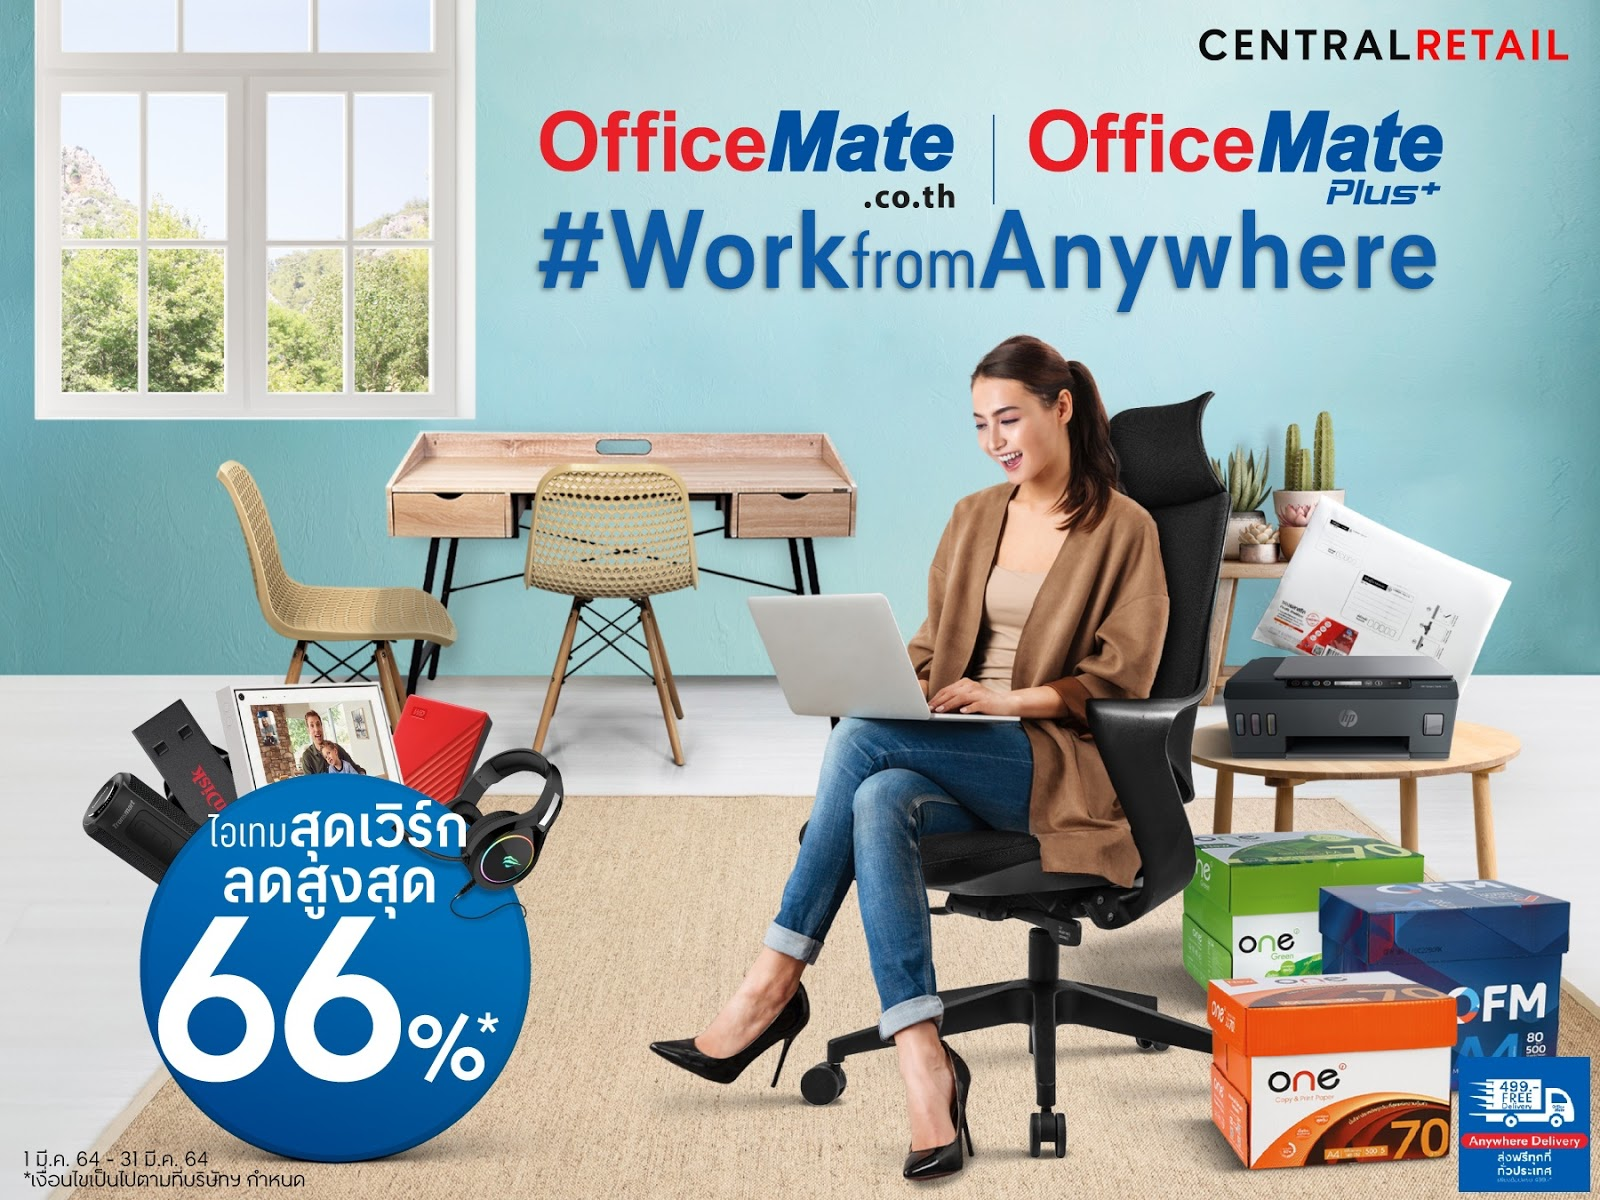 OfficeMate ช่วยคนขยันให้ WORK #NewNormal ได้ทุกที่ทุกเวลา จัดโปรฯ ลดสูงสุด 66% ตลอดเดือนมีนาคม 2564